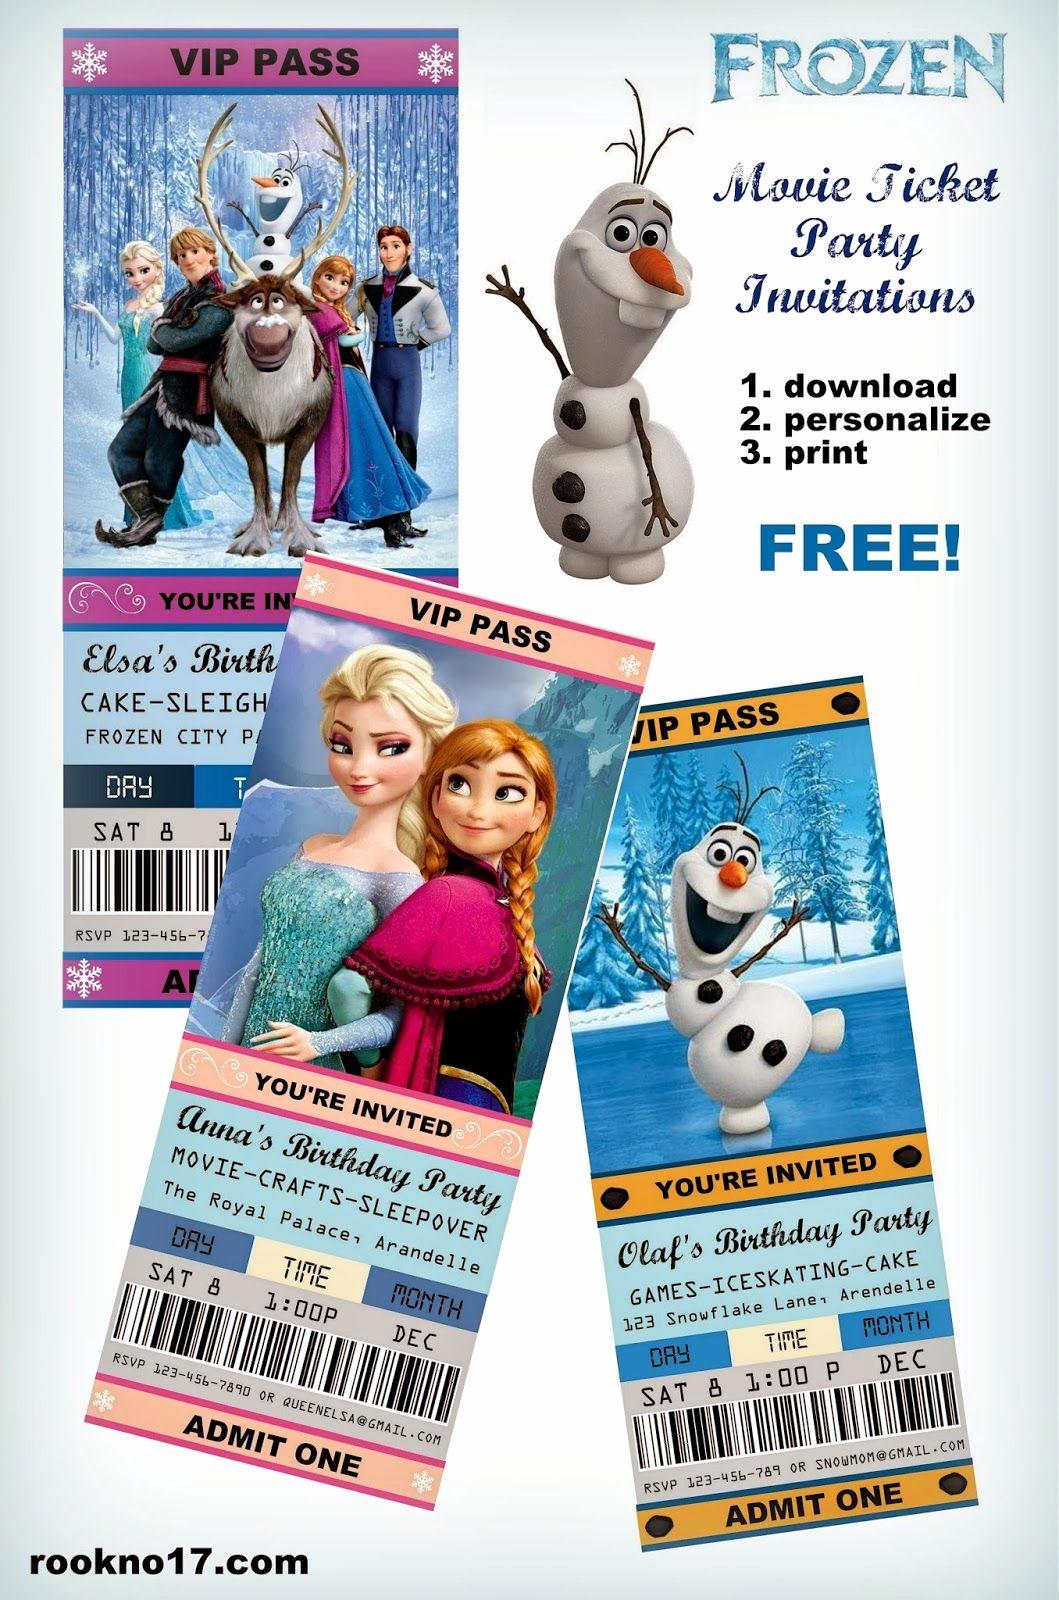 Frozen Invitation Printable Free Lovely Free Frozen Invitations On Pinterest